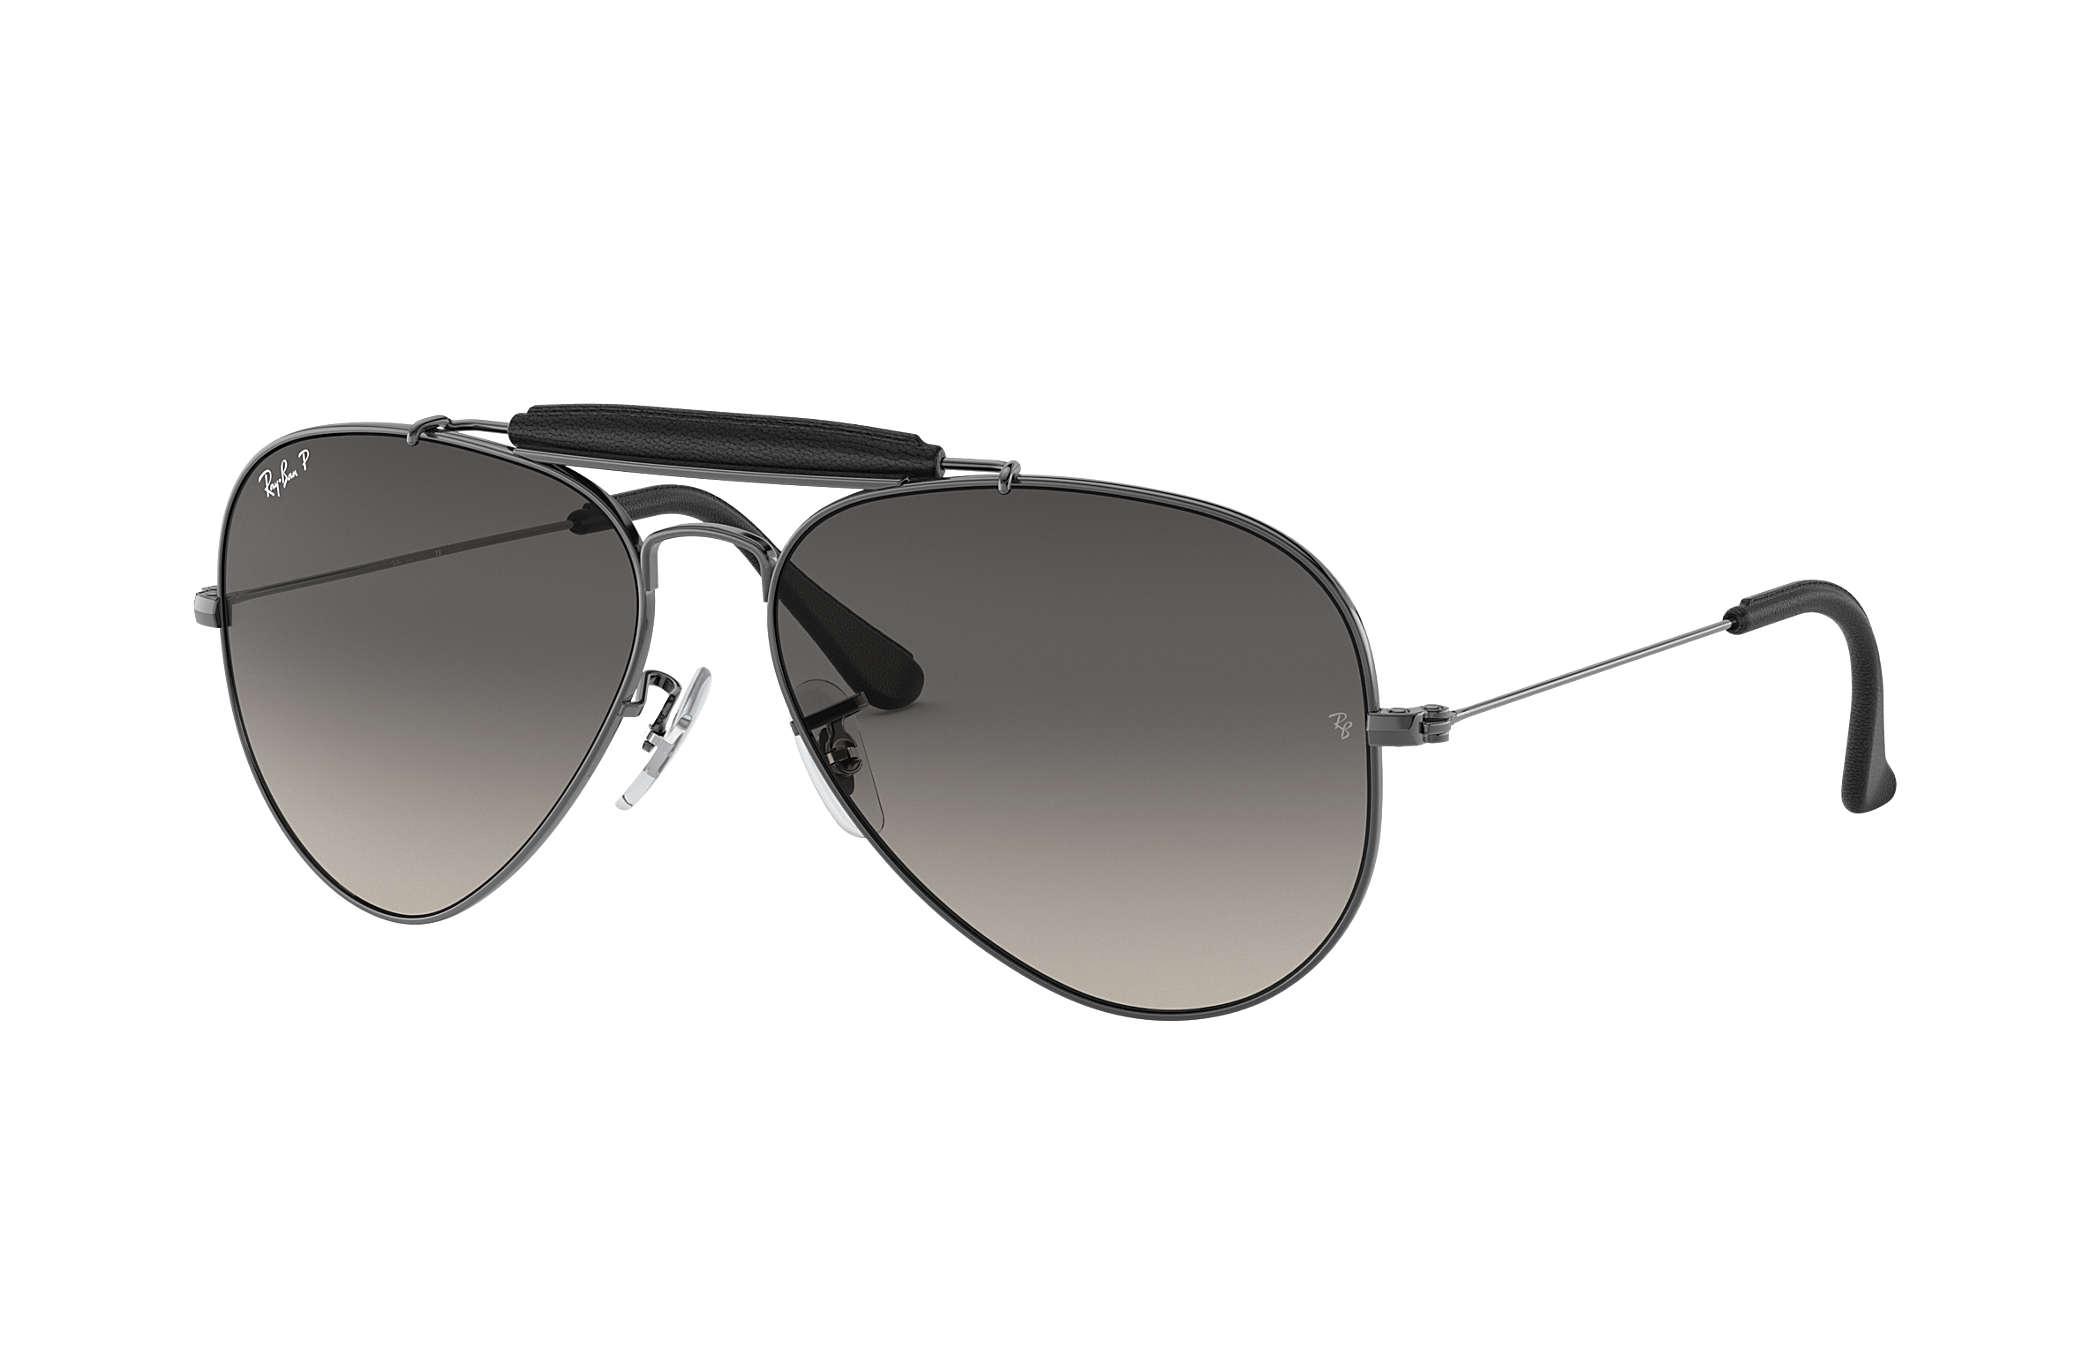 9d665f7e60 Ray Ban Rb3428 Outdoorsman Aviator Sunglasses « Heritage Malta